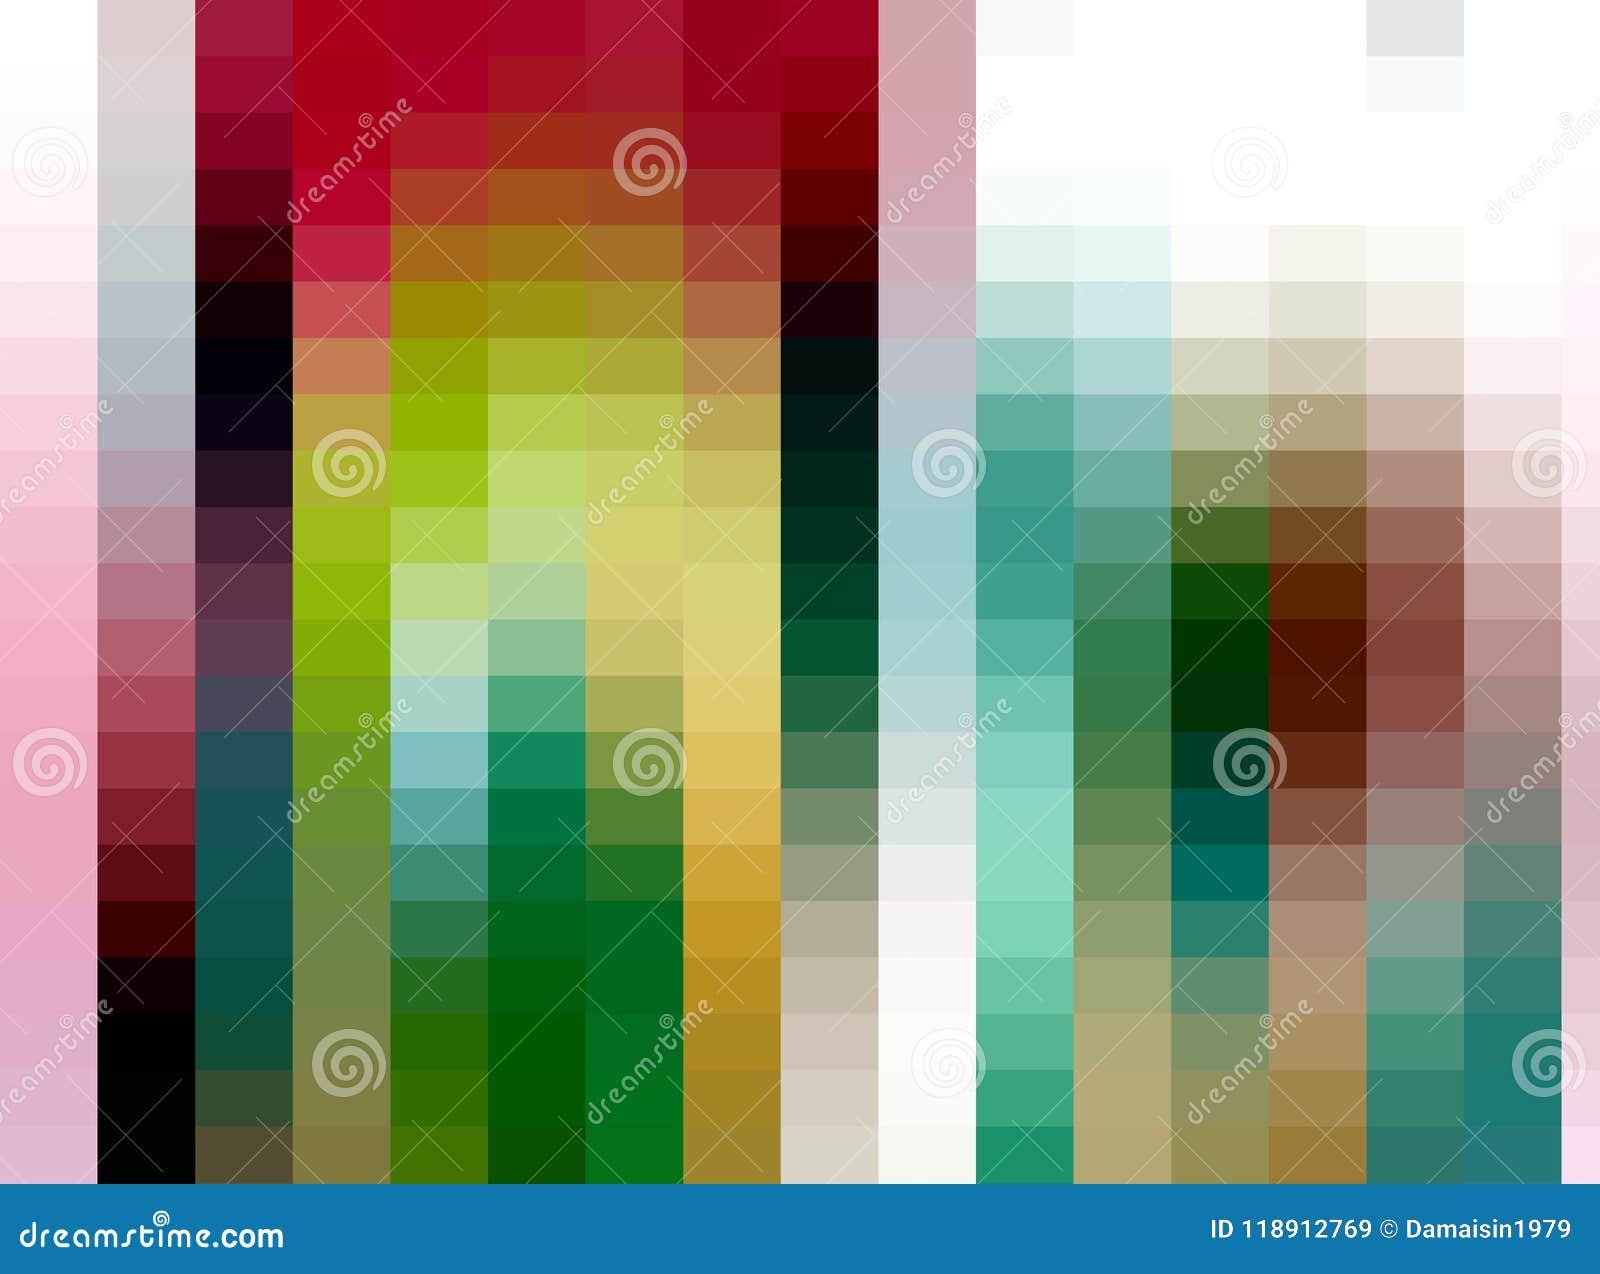 Abstracte vierkante achtergrond, kleuren, schaduwen, grafiek